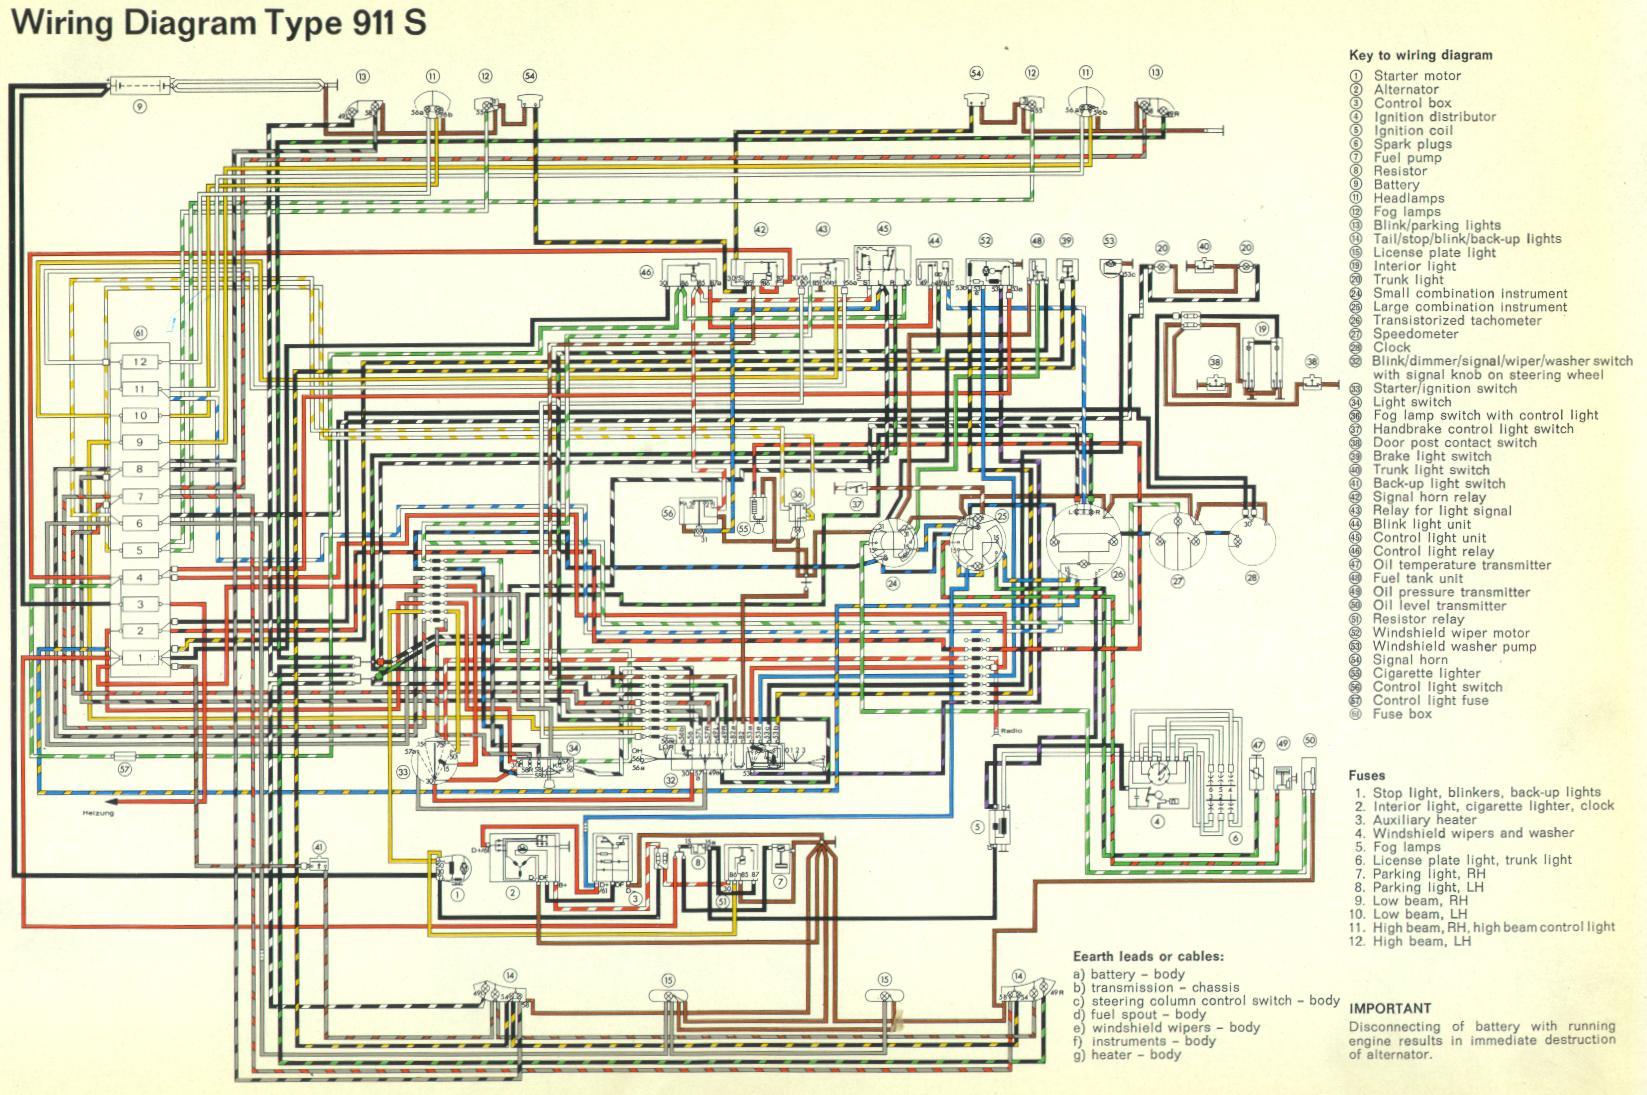 Antenna Relay Wiring Diagram Gt Power Supplies Gt Free Energy Circuits Gt Selfrunning Free